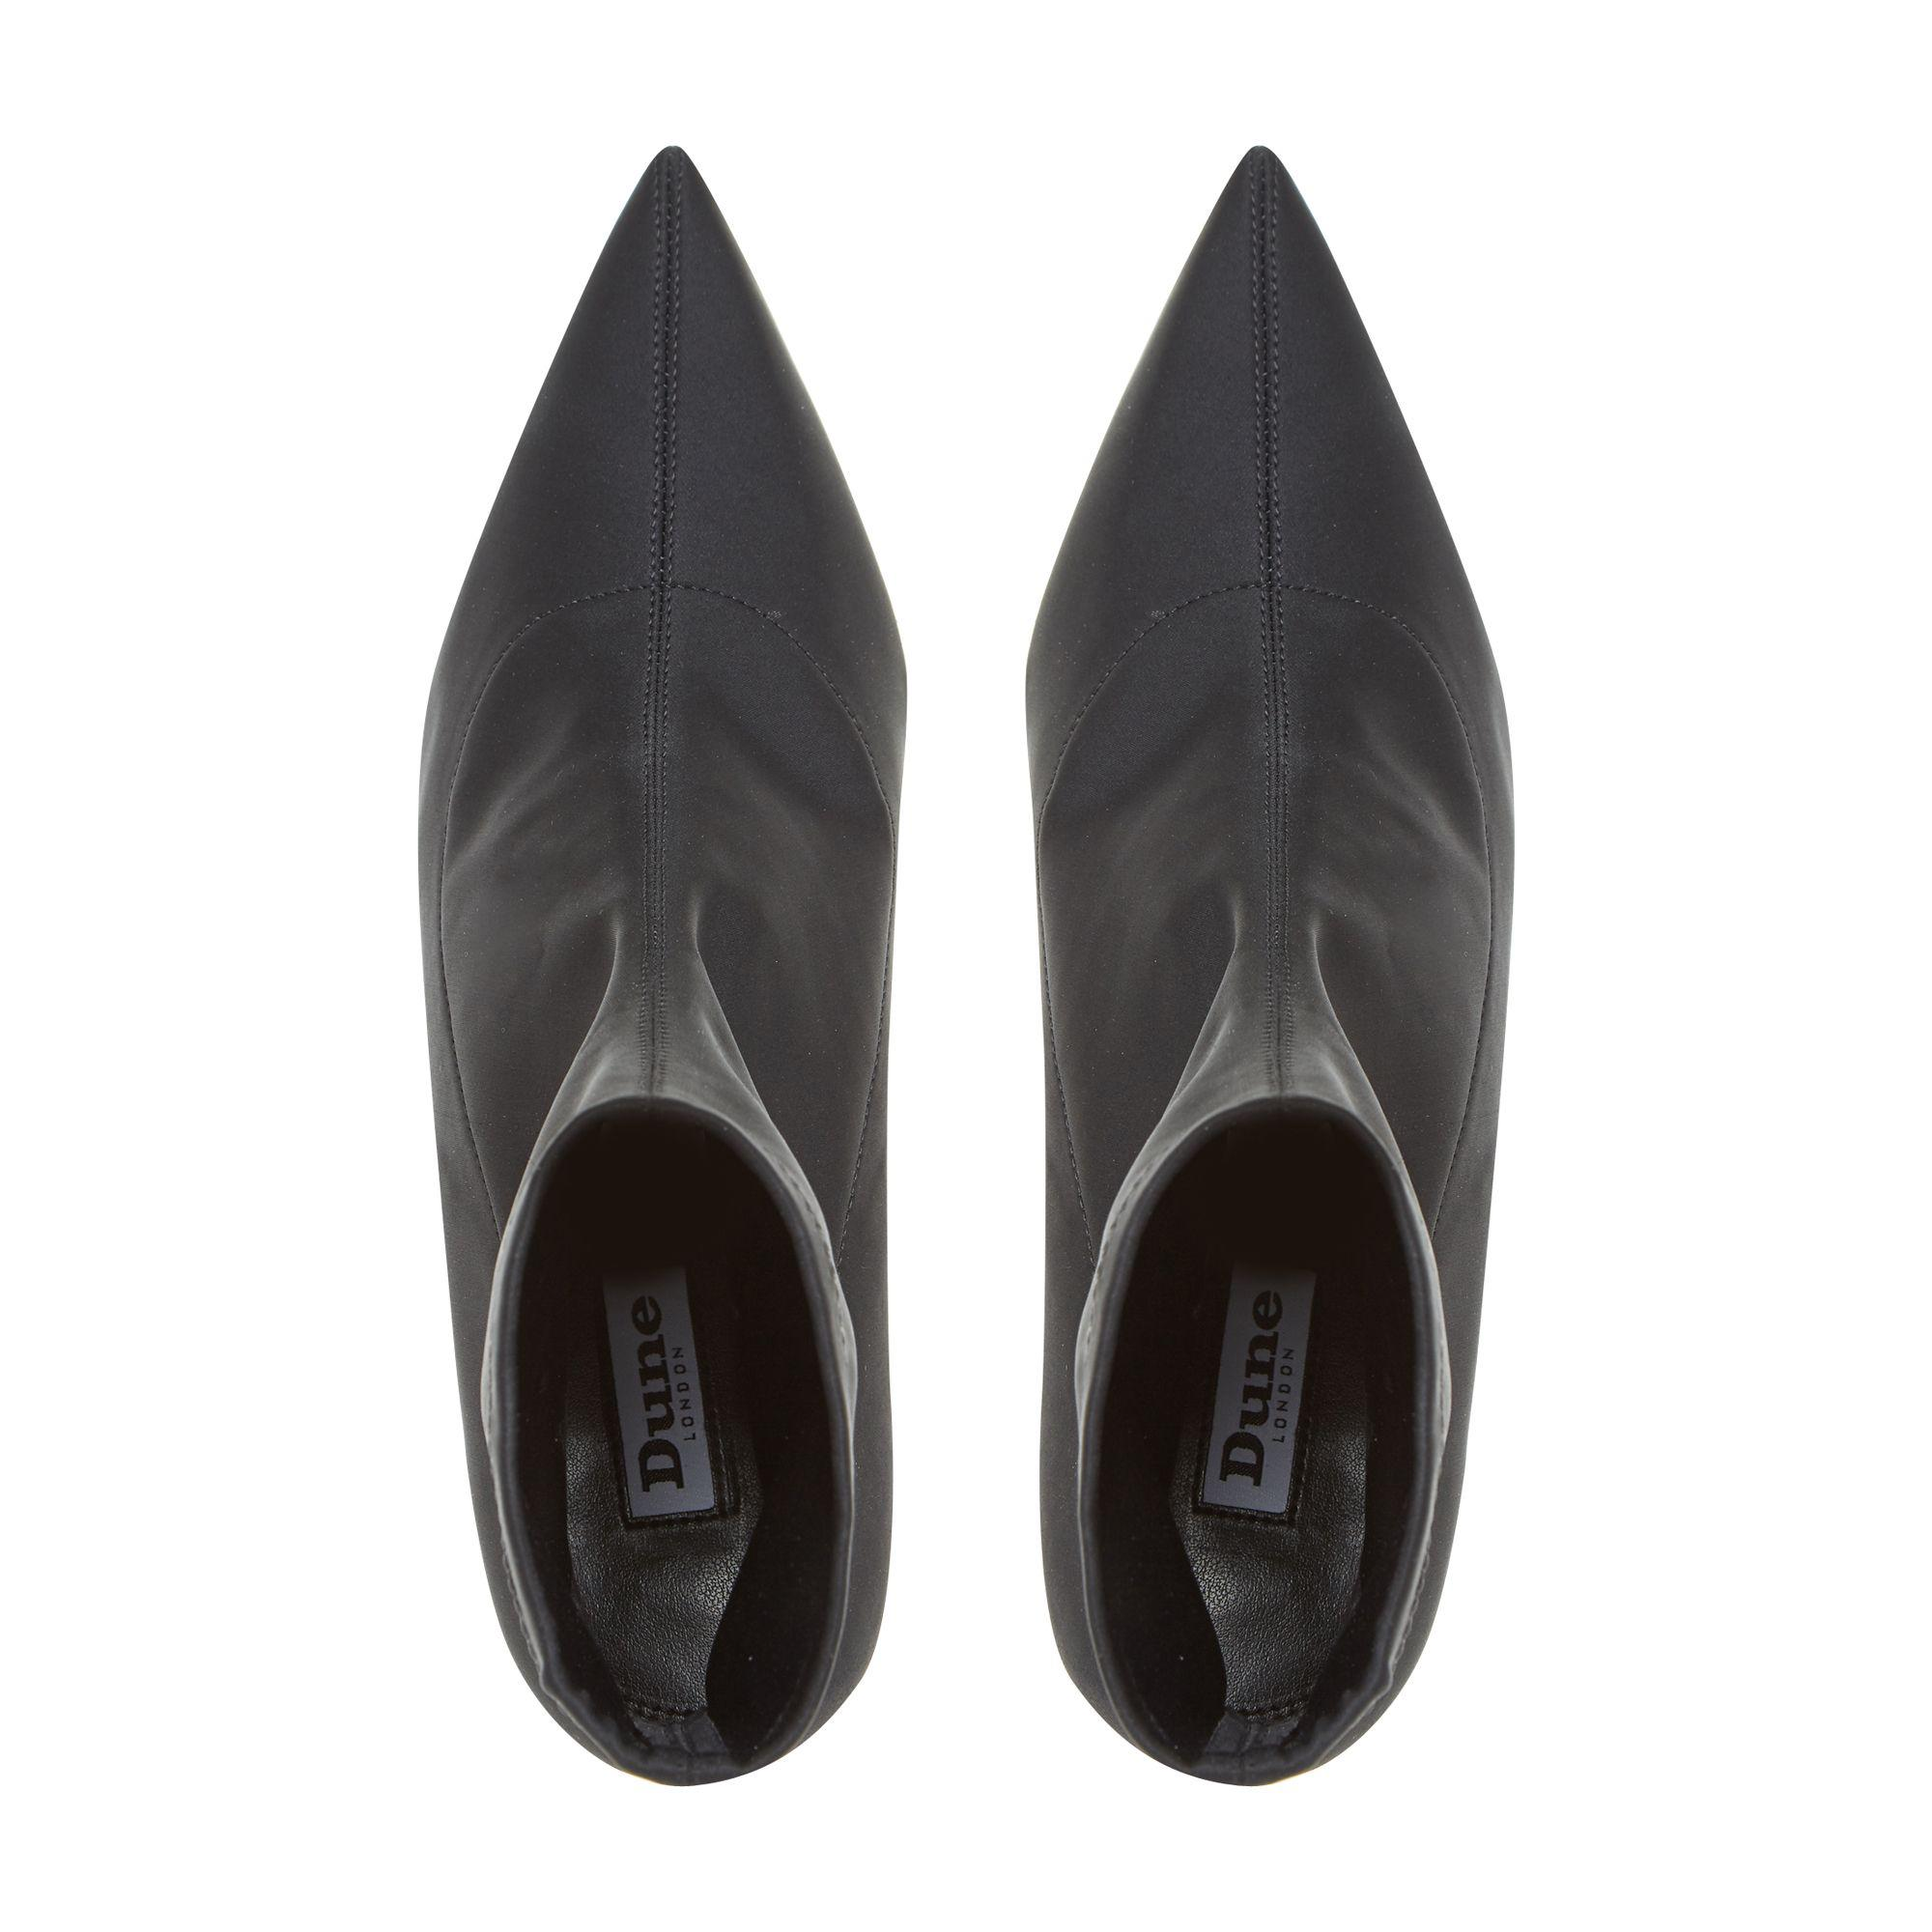 fa0091a1b500d Dune Black 'opelli' Stretch Kitten Heel Ankle Boots in Black - Lyst